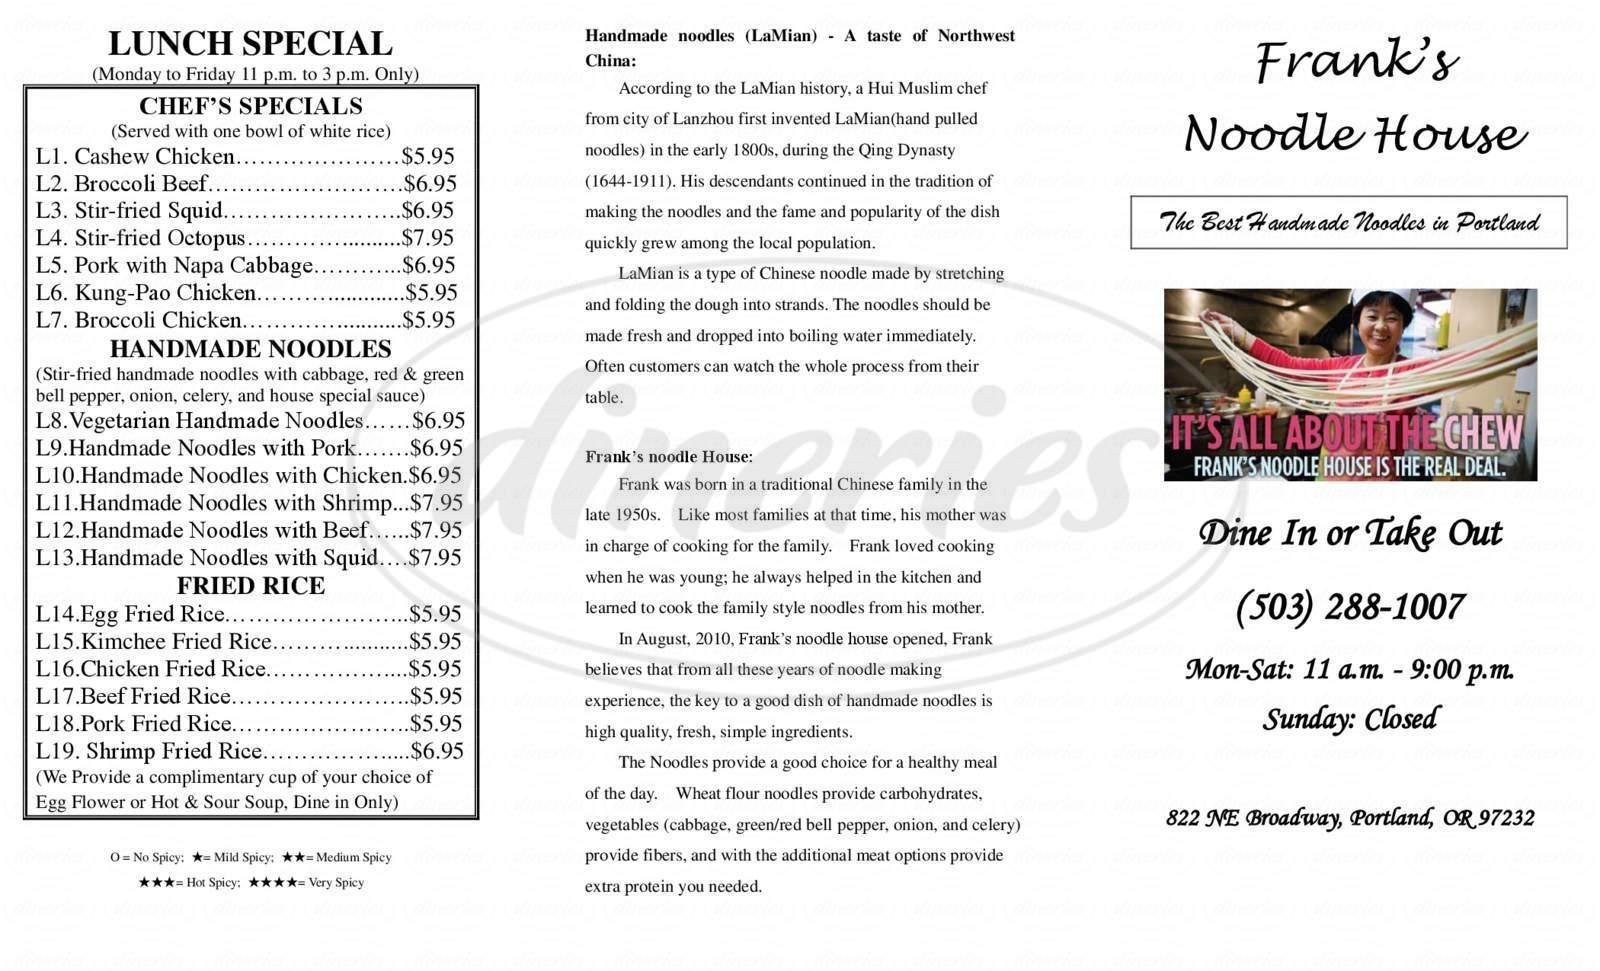 menu for Frank's Noodle House